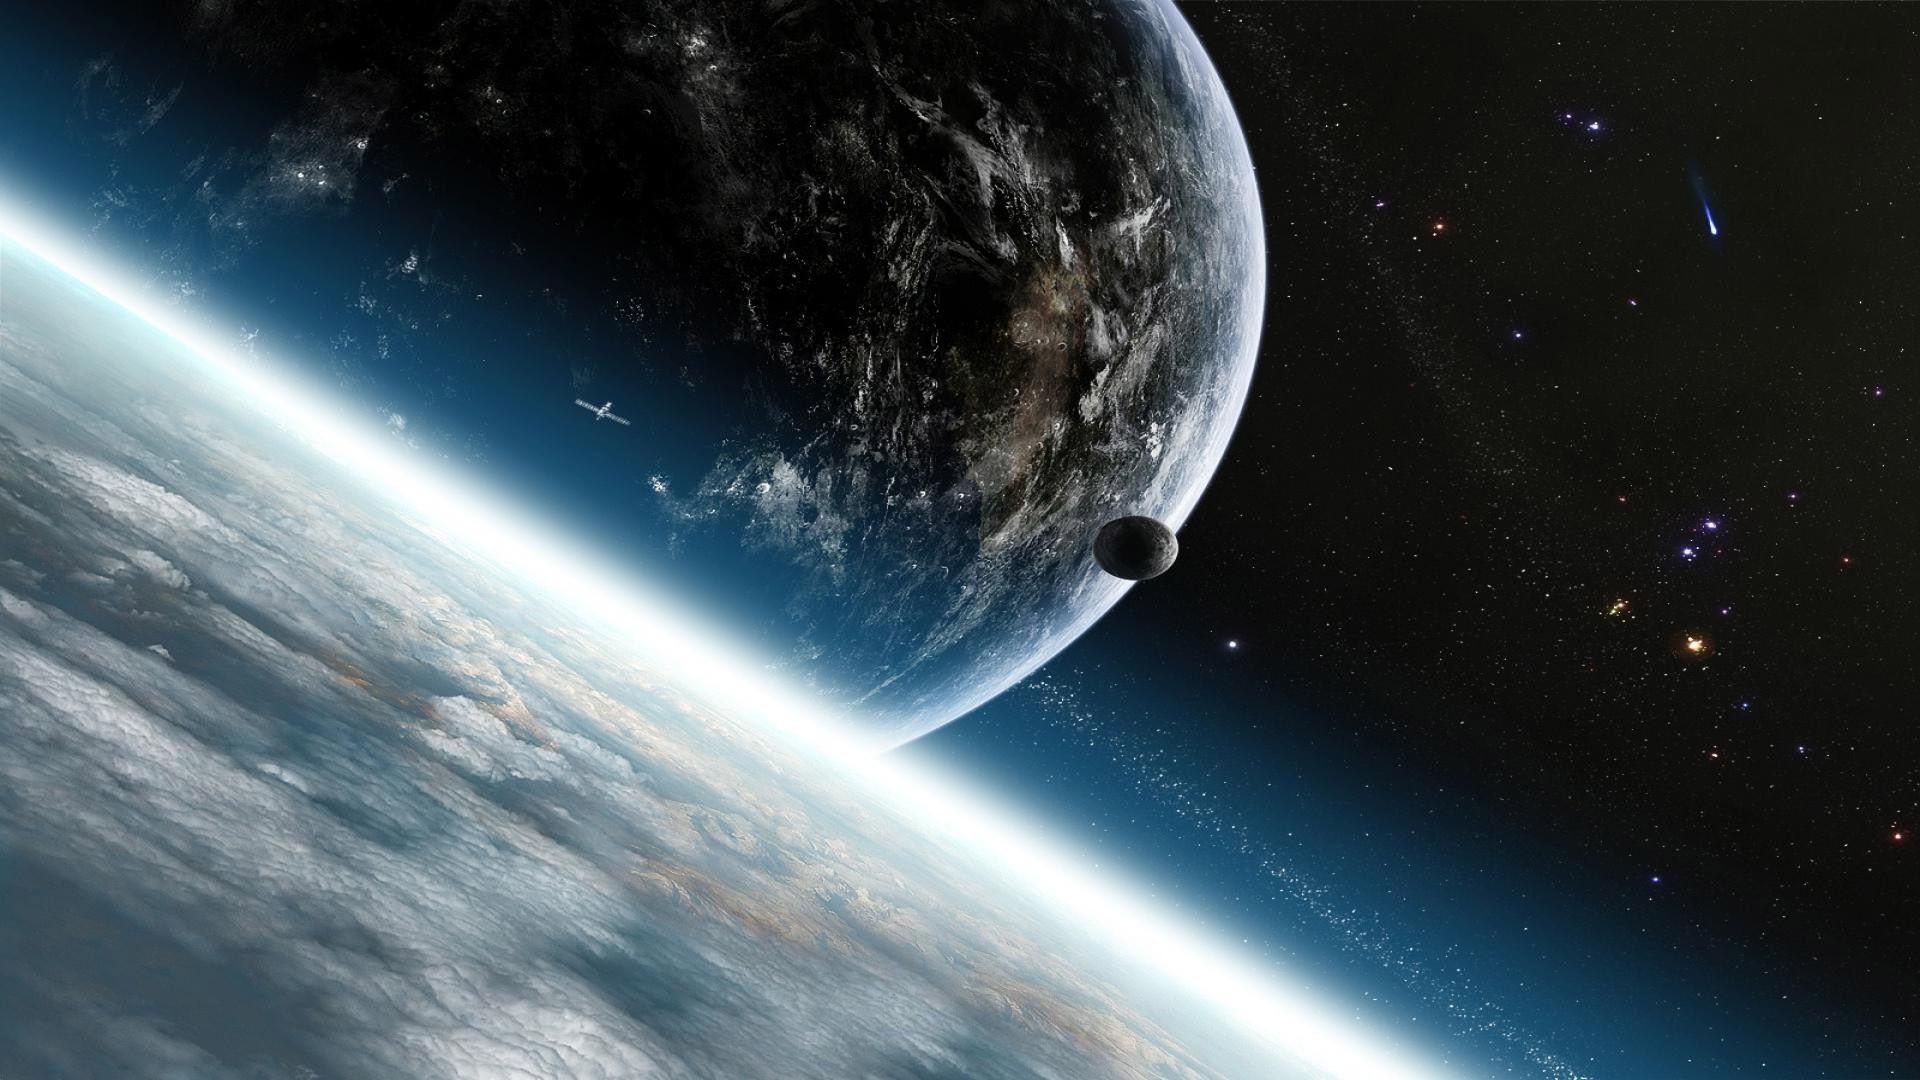 Dark Planet Space Image.